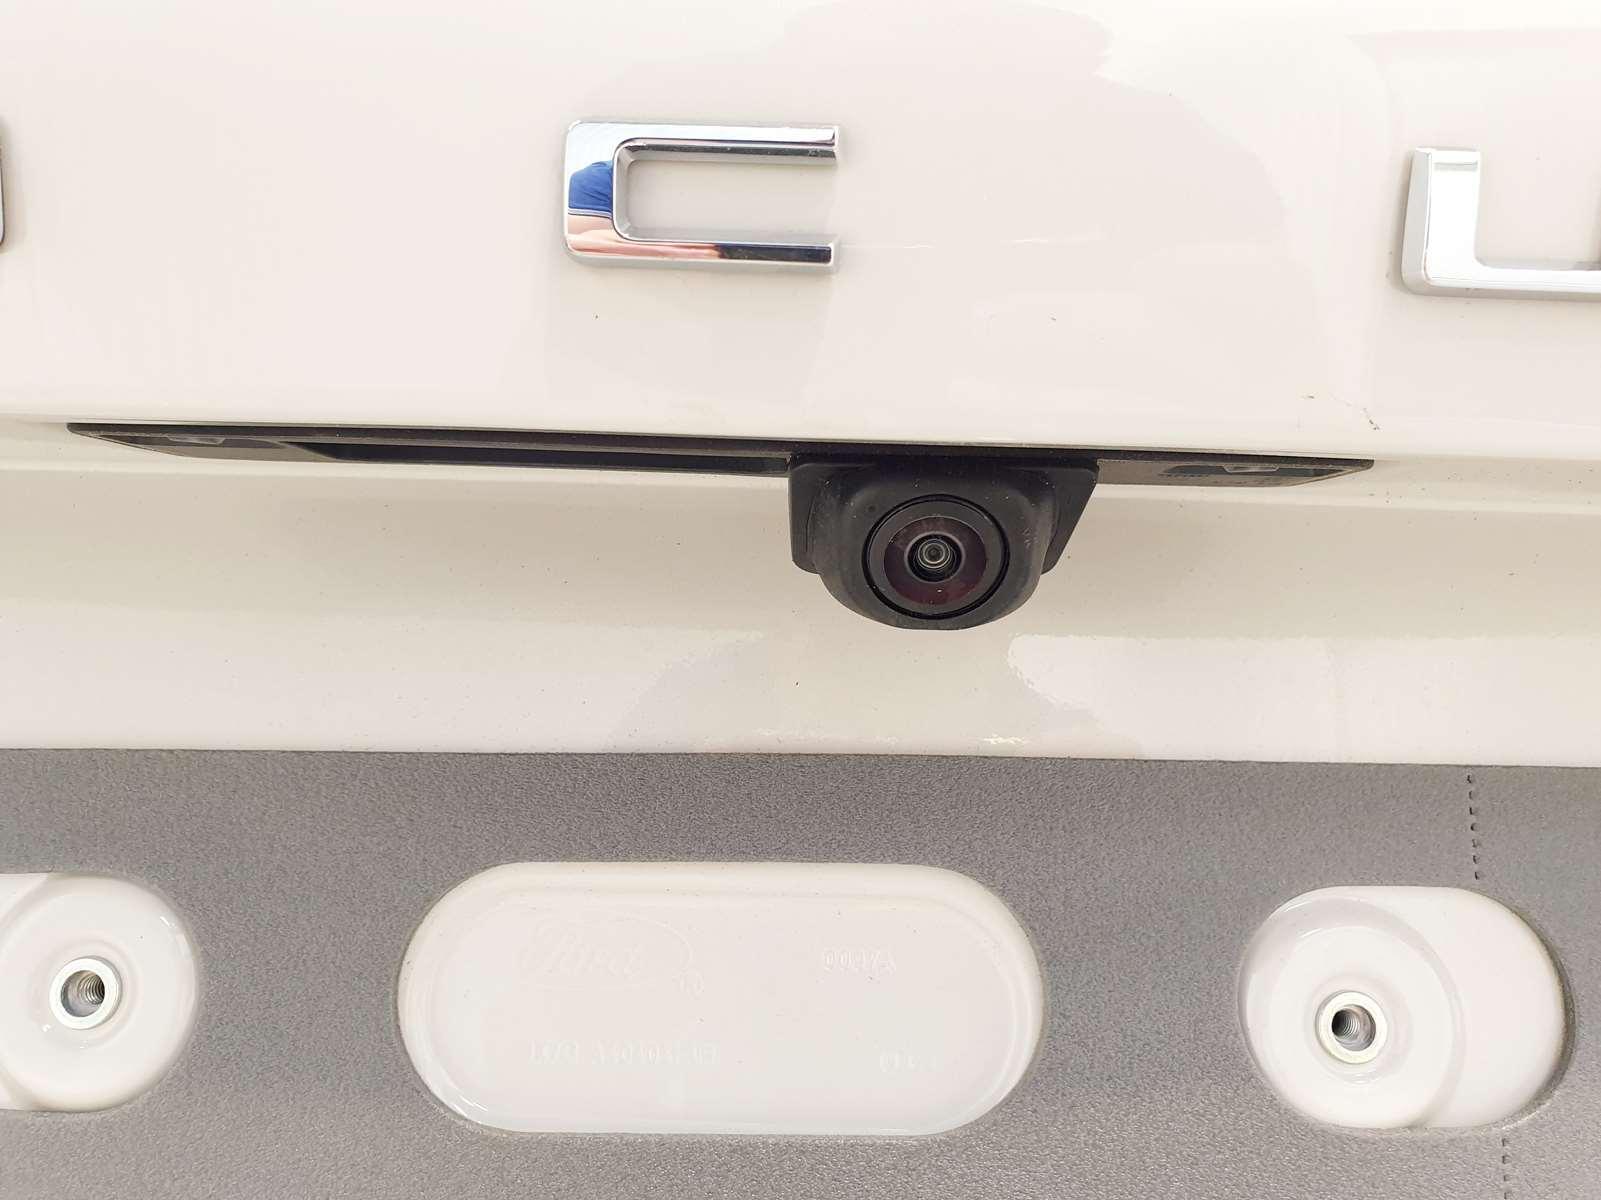 Miniature FORD FOCUS 1.5 EcoBlue 120 S&S ST Line